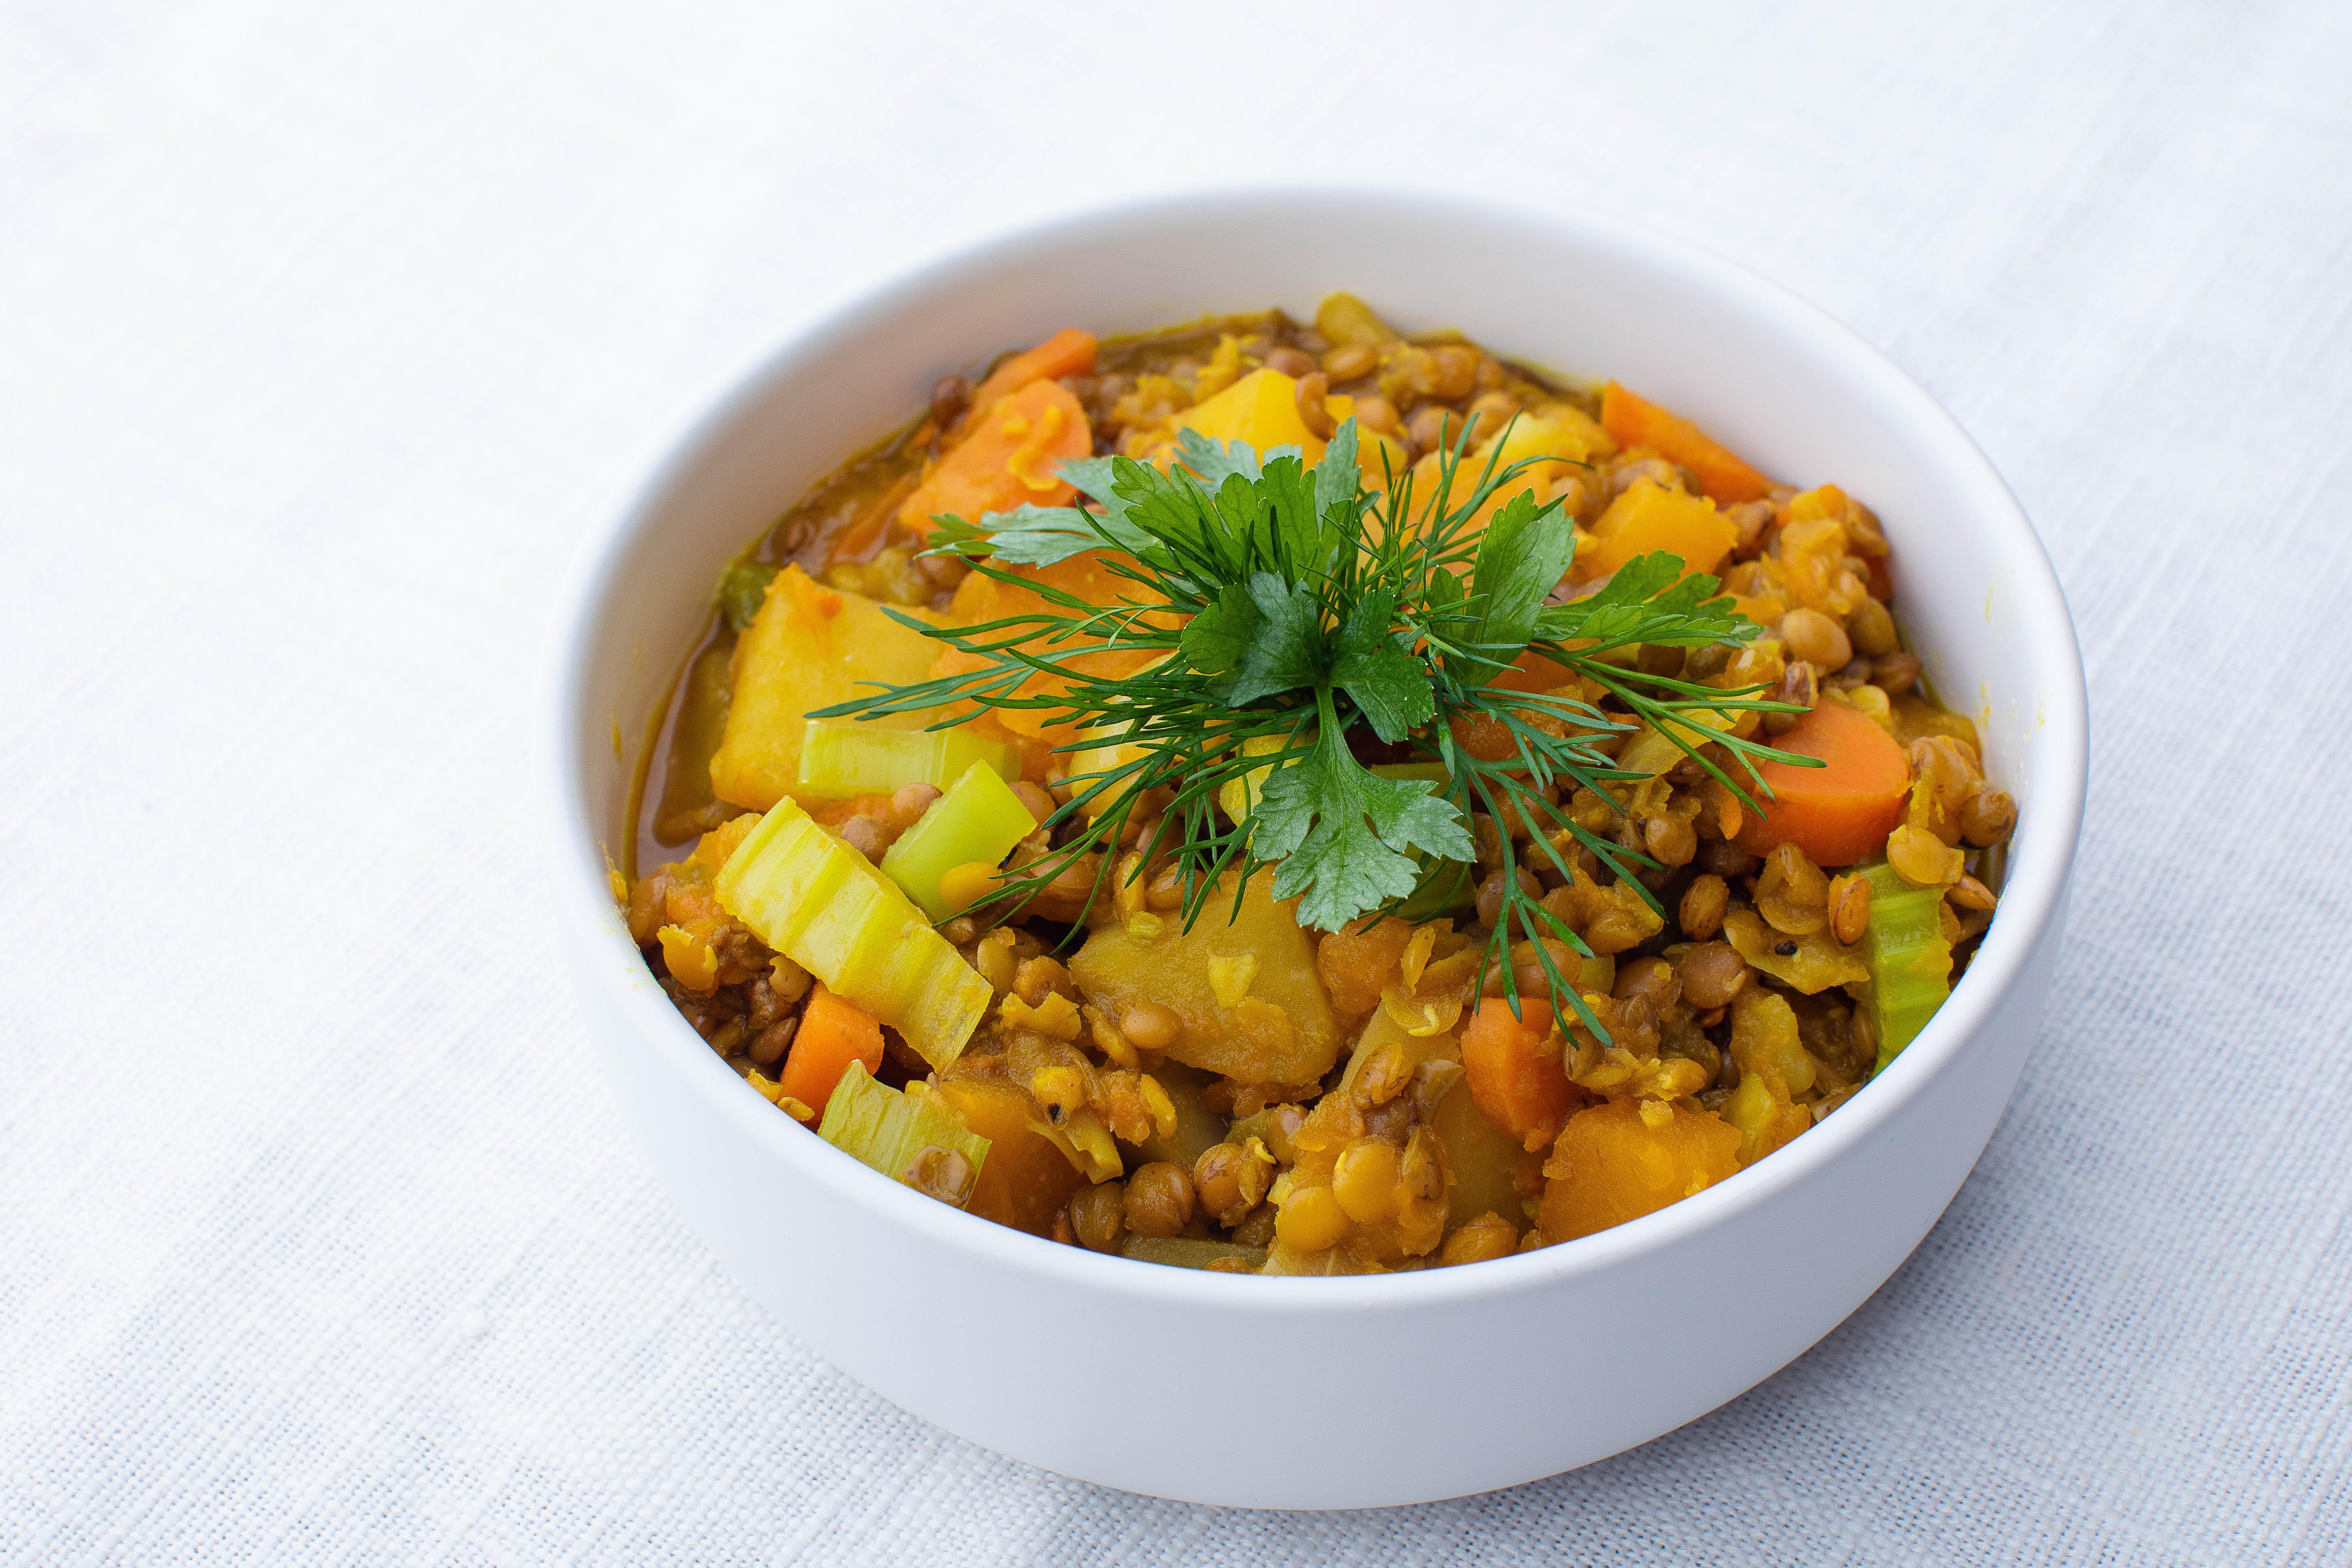 Lentil and vegetable hotpot